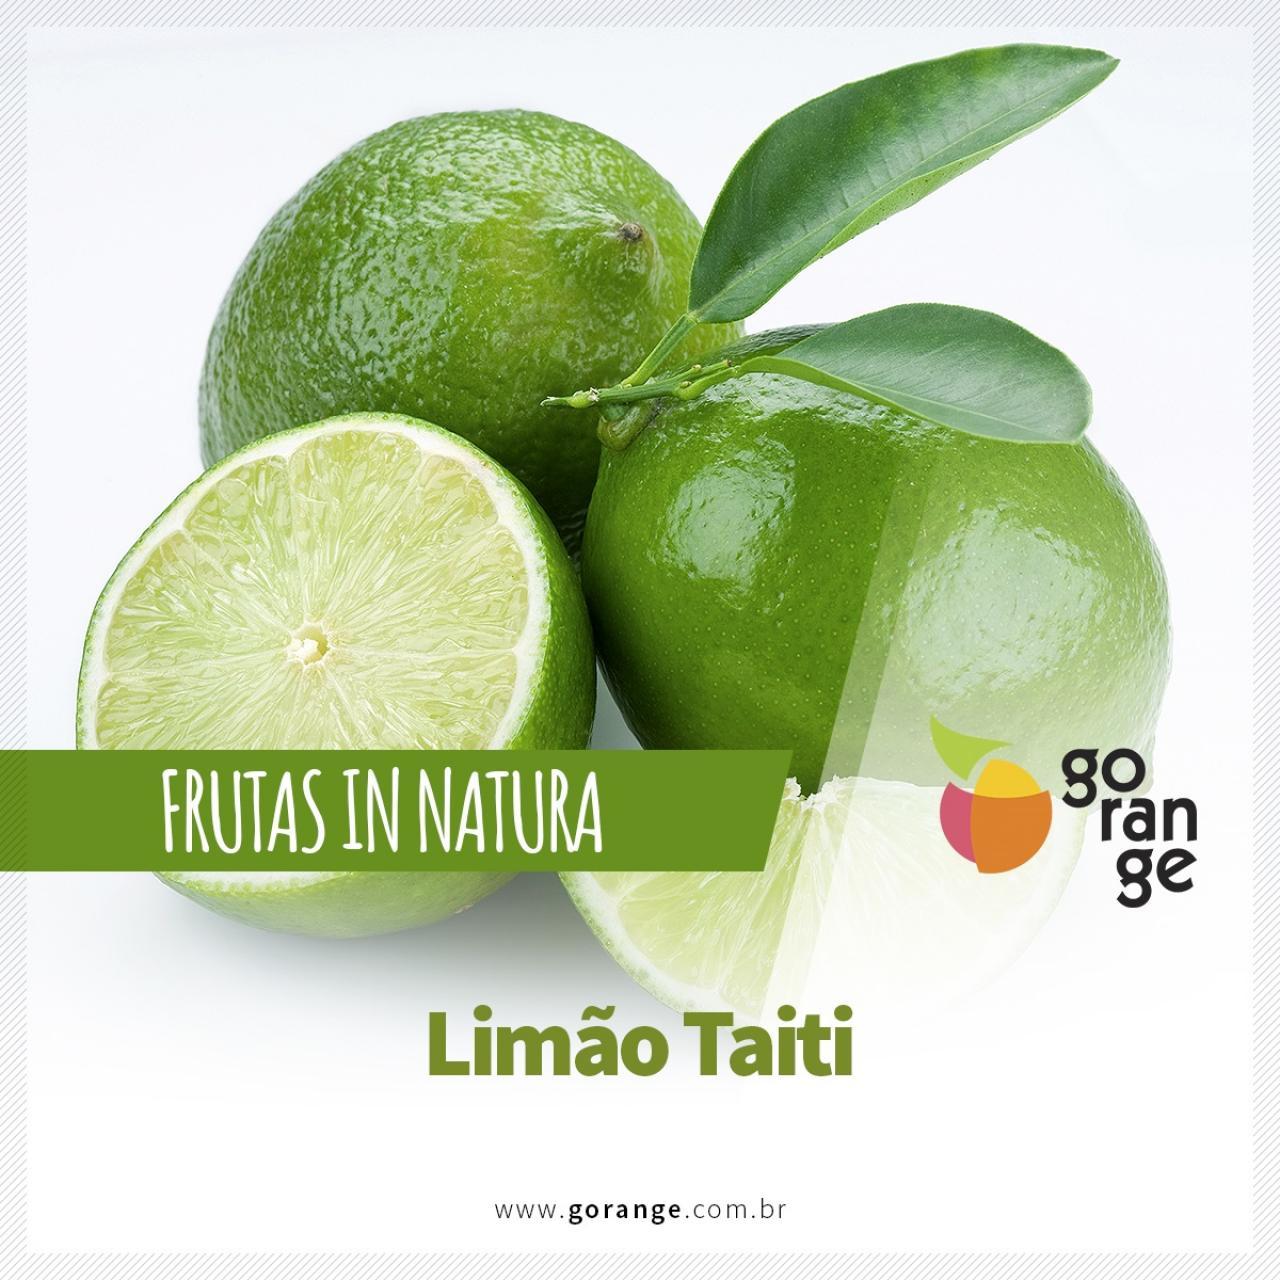 Frutas In Natura: Limão Taiti